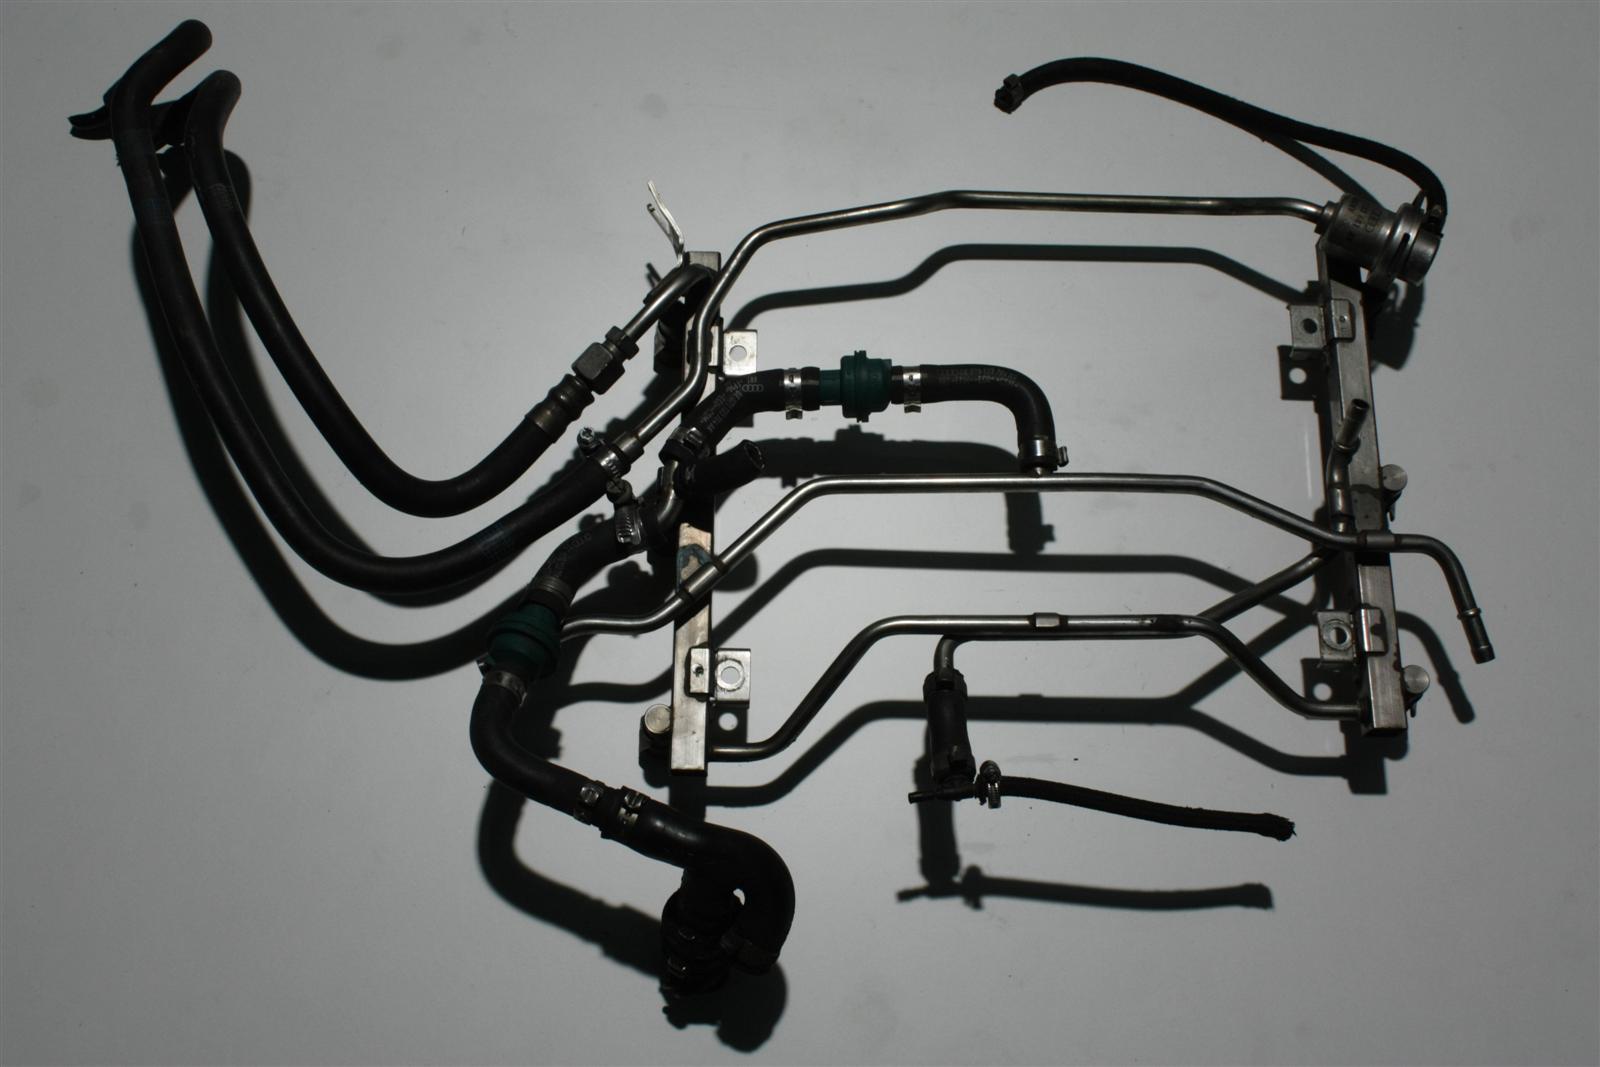 Audi S4 B5/A6 4B 2.7l Biturbo AGB Einspritzleiste + Benzindruckregler 078133681AK